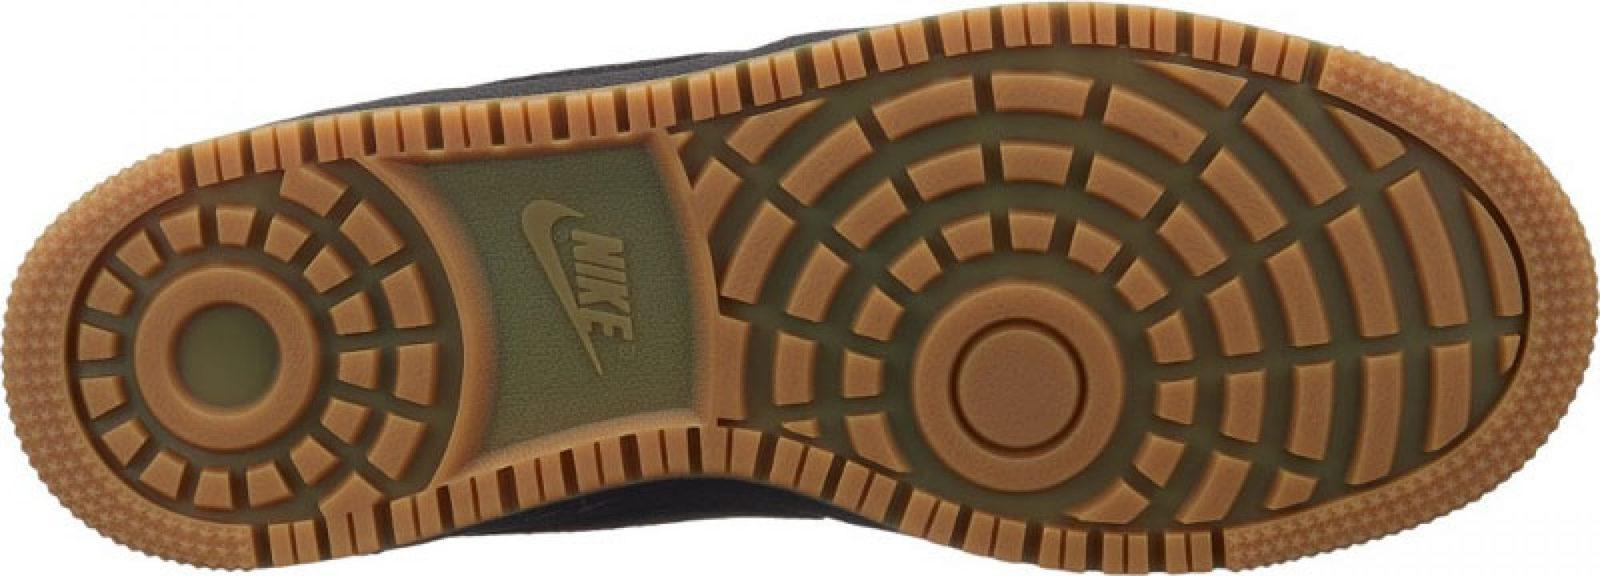 09aabdc5595 Nike Ebernon Mid Winter · Nike Ebernon Mid Winter ...